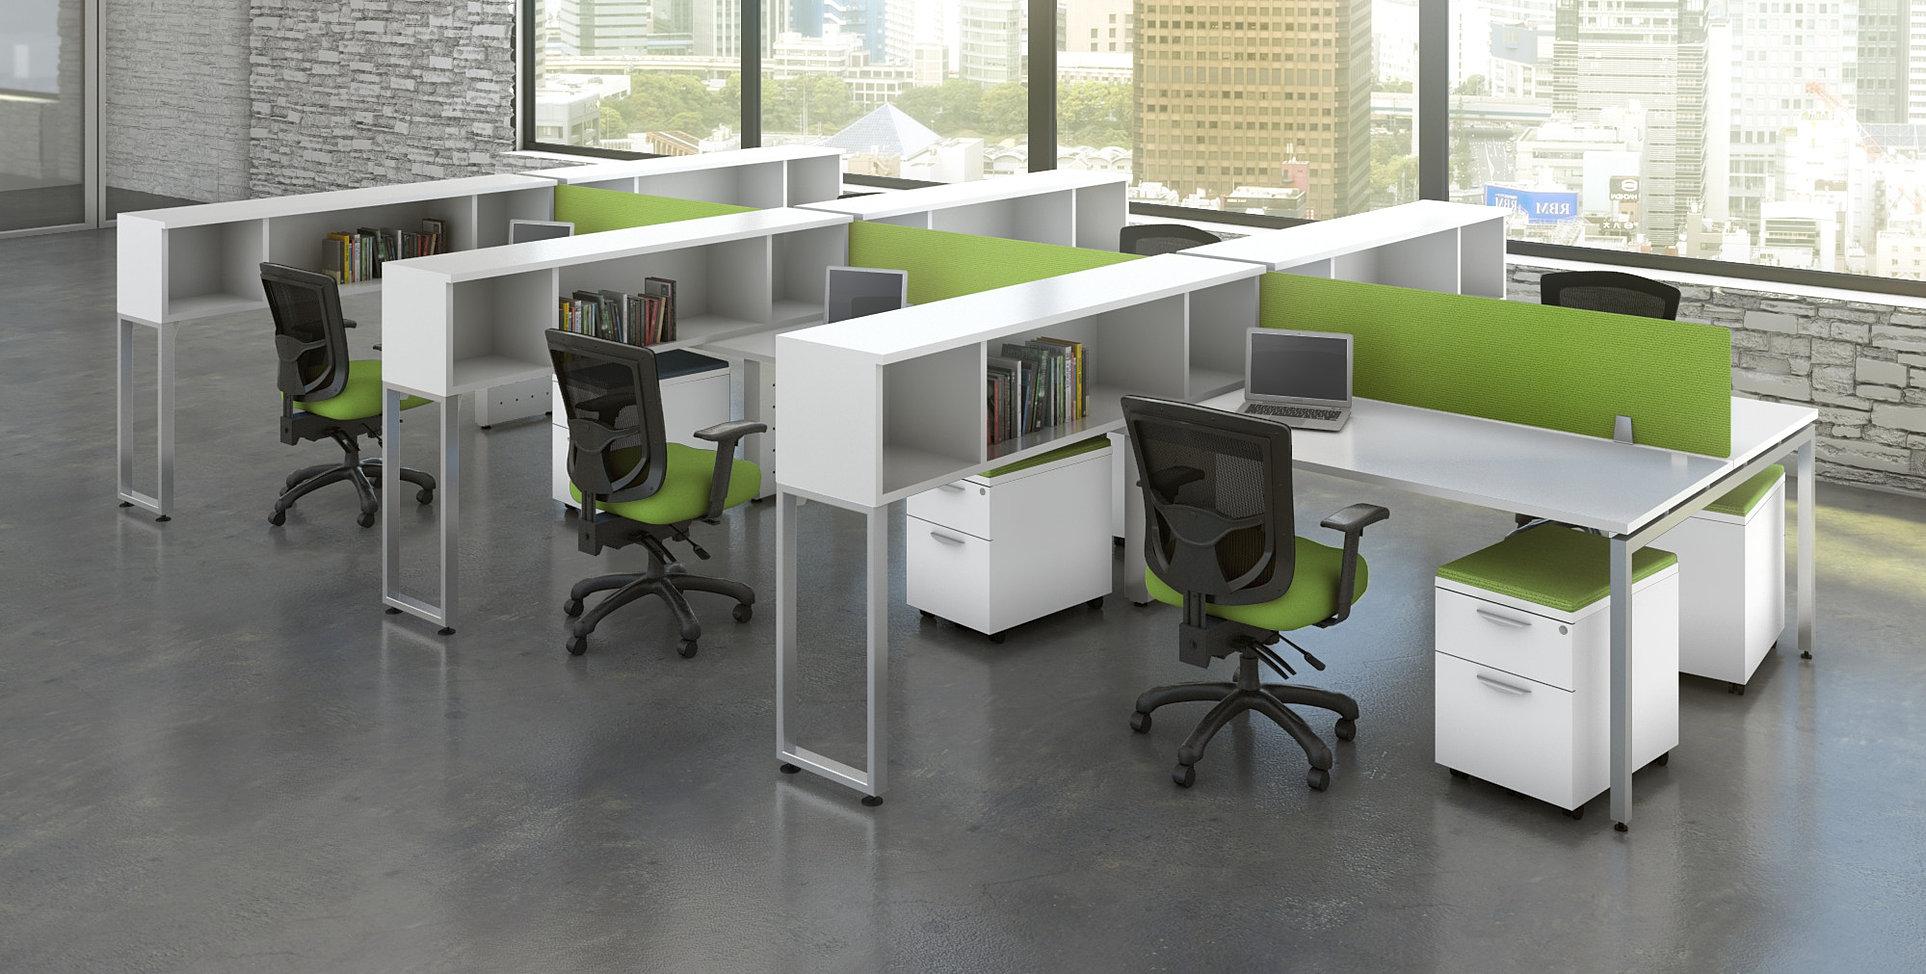 fresh gallery of office furniture sacramento